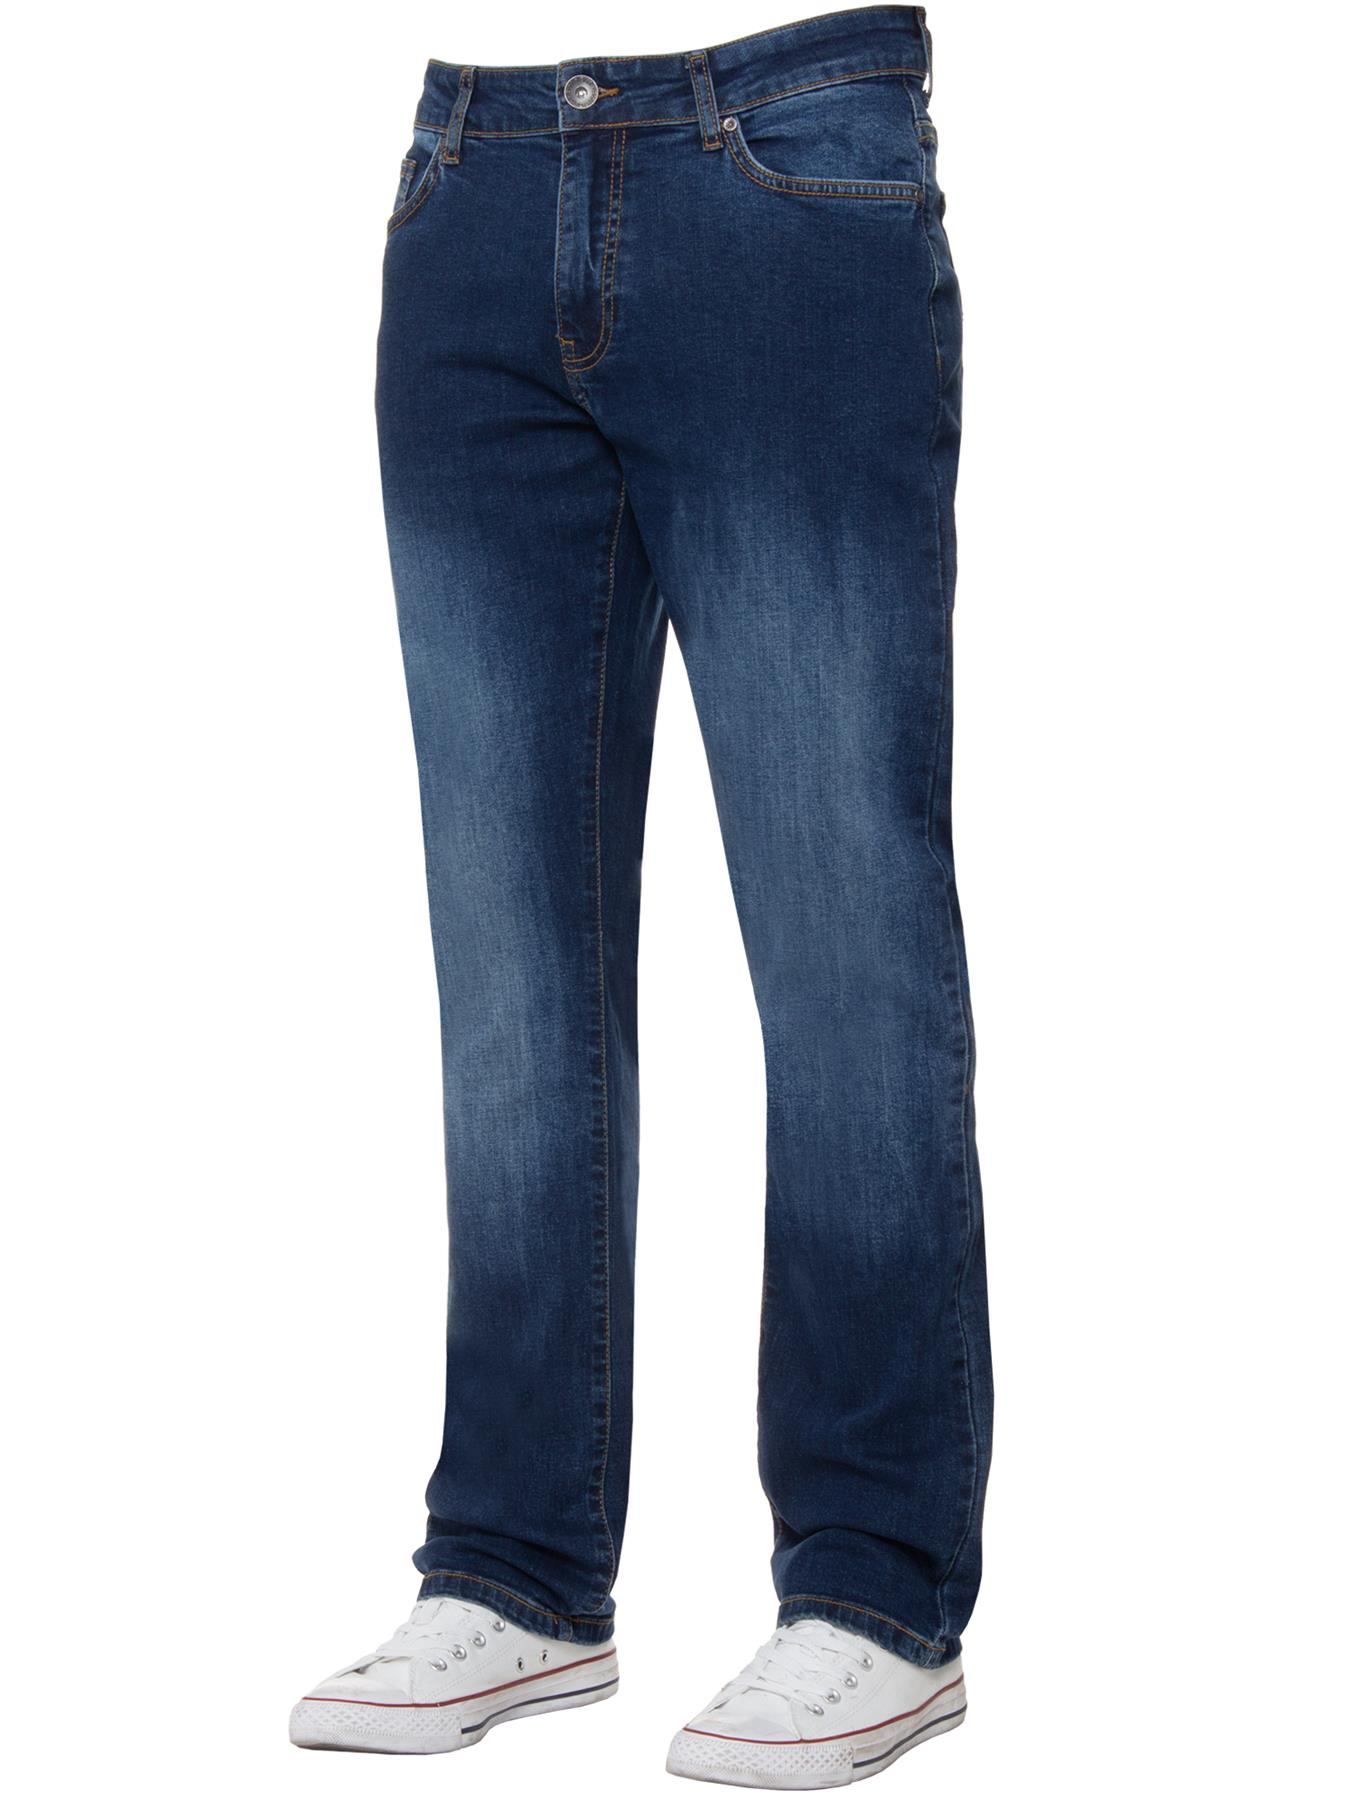 Para-Hombre-Pierna-Recta-Bootcut-Stretch-Denim-Regulares-Pantalon-de-trabajo-Kruze-Todas-Cinturas miniatura 42